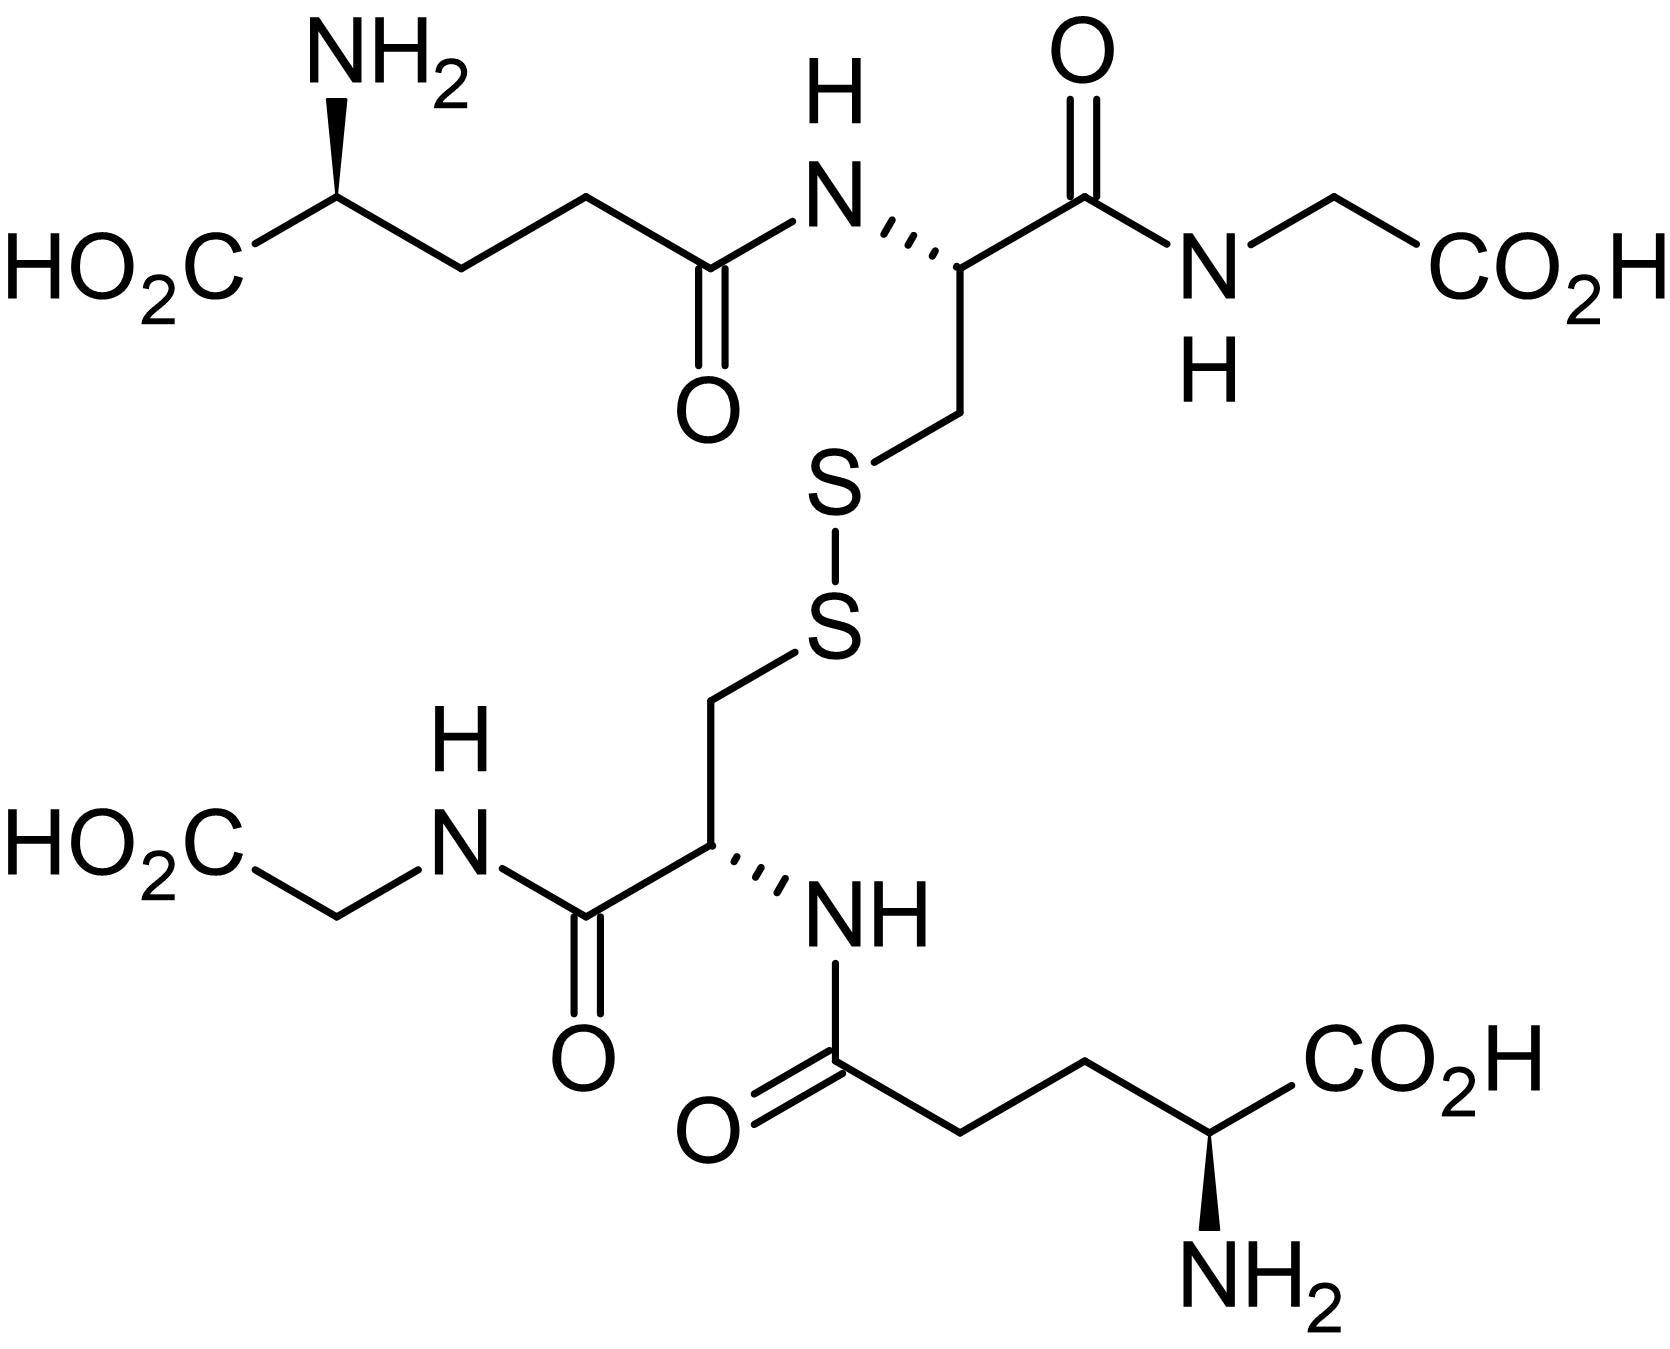 Chemical Structure - Oxidized glutathione (GSSG), Hydrogen acceptor (ab141393)